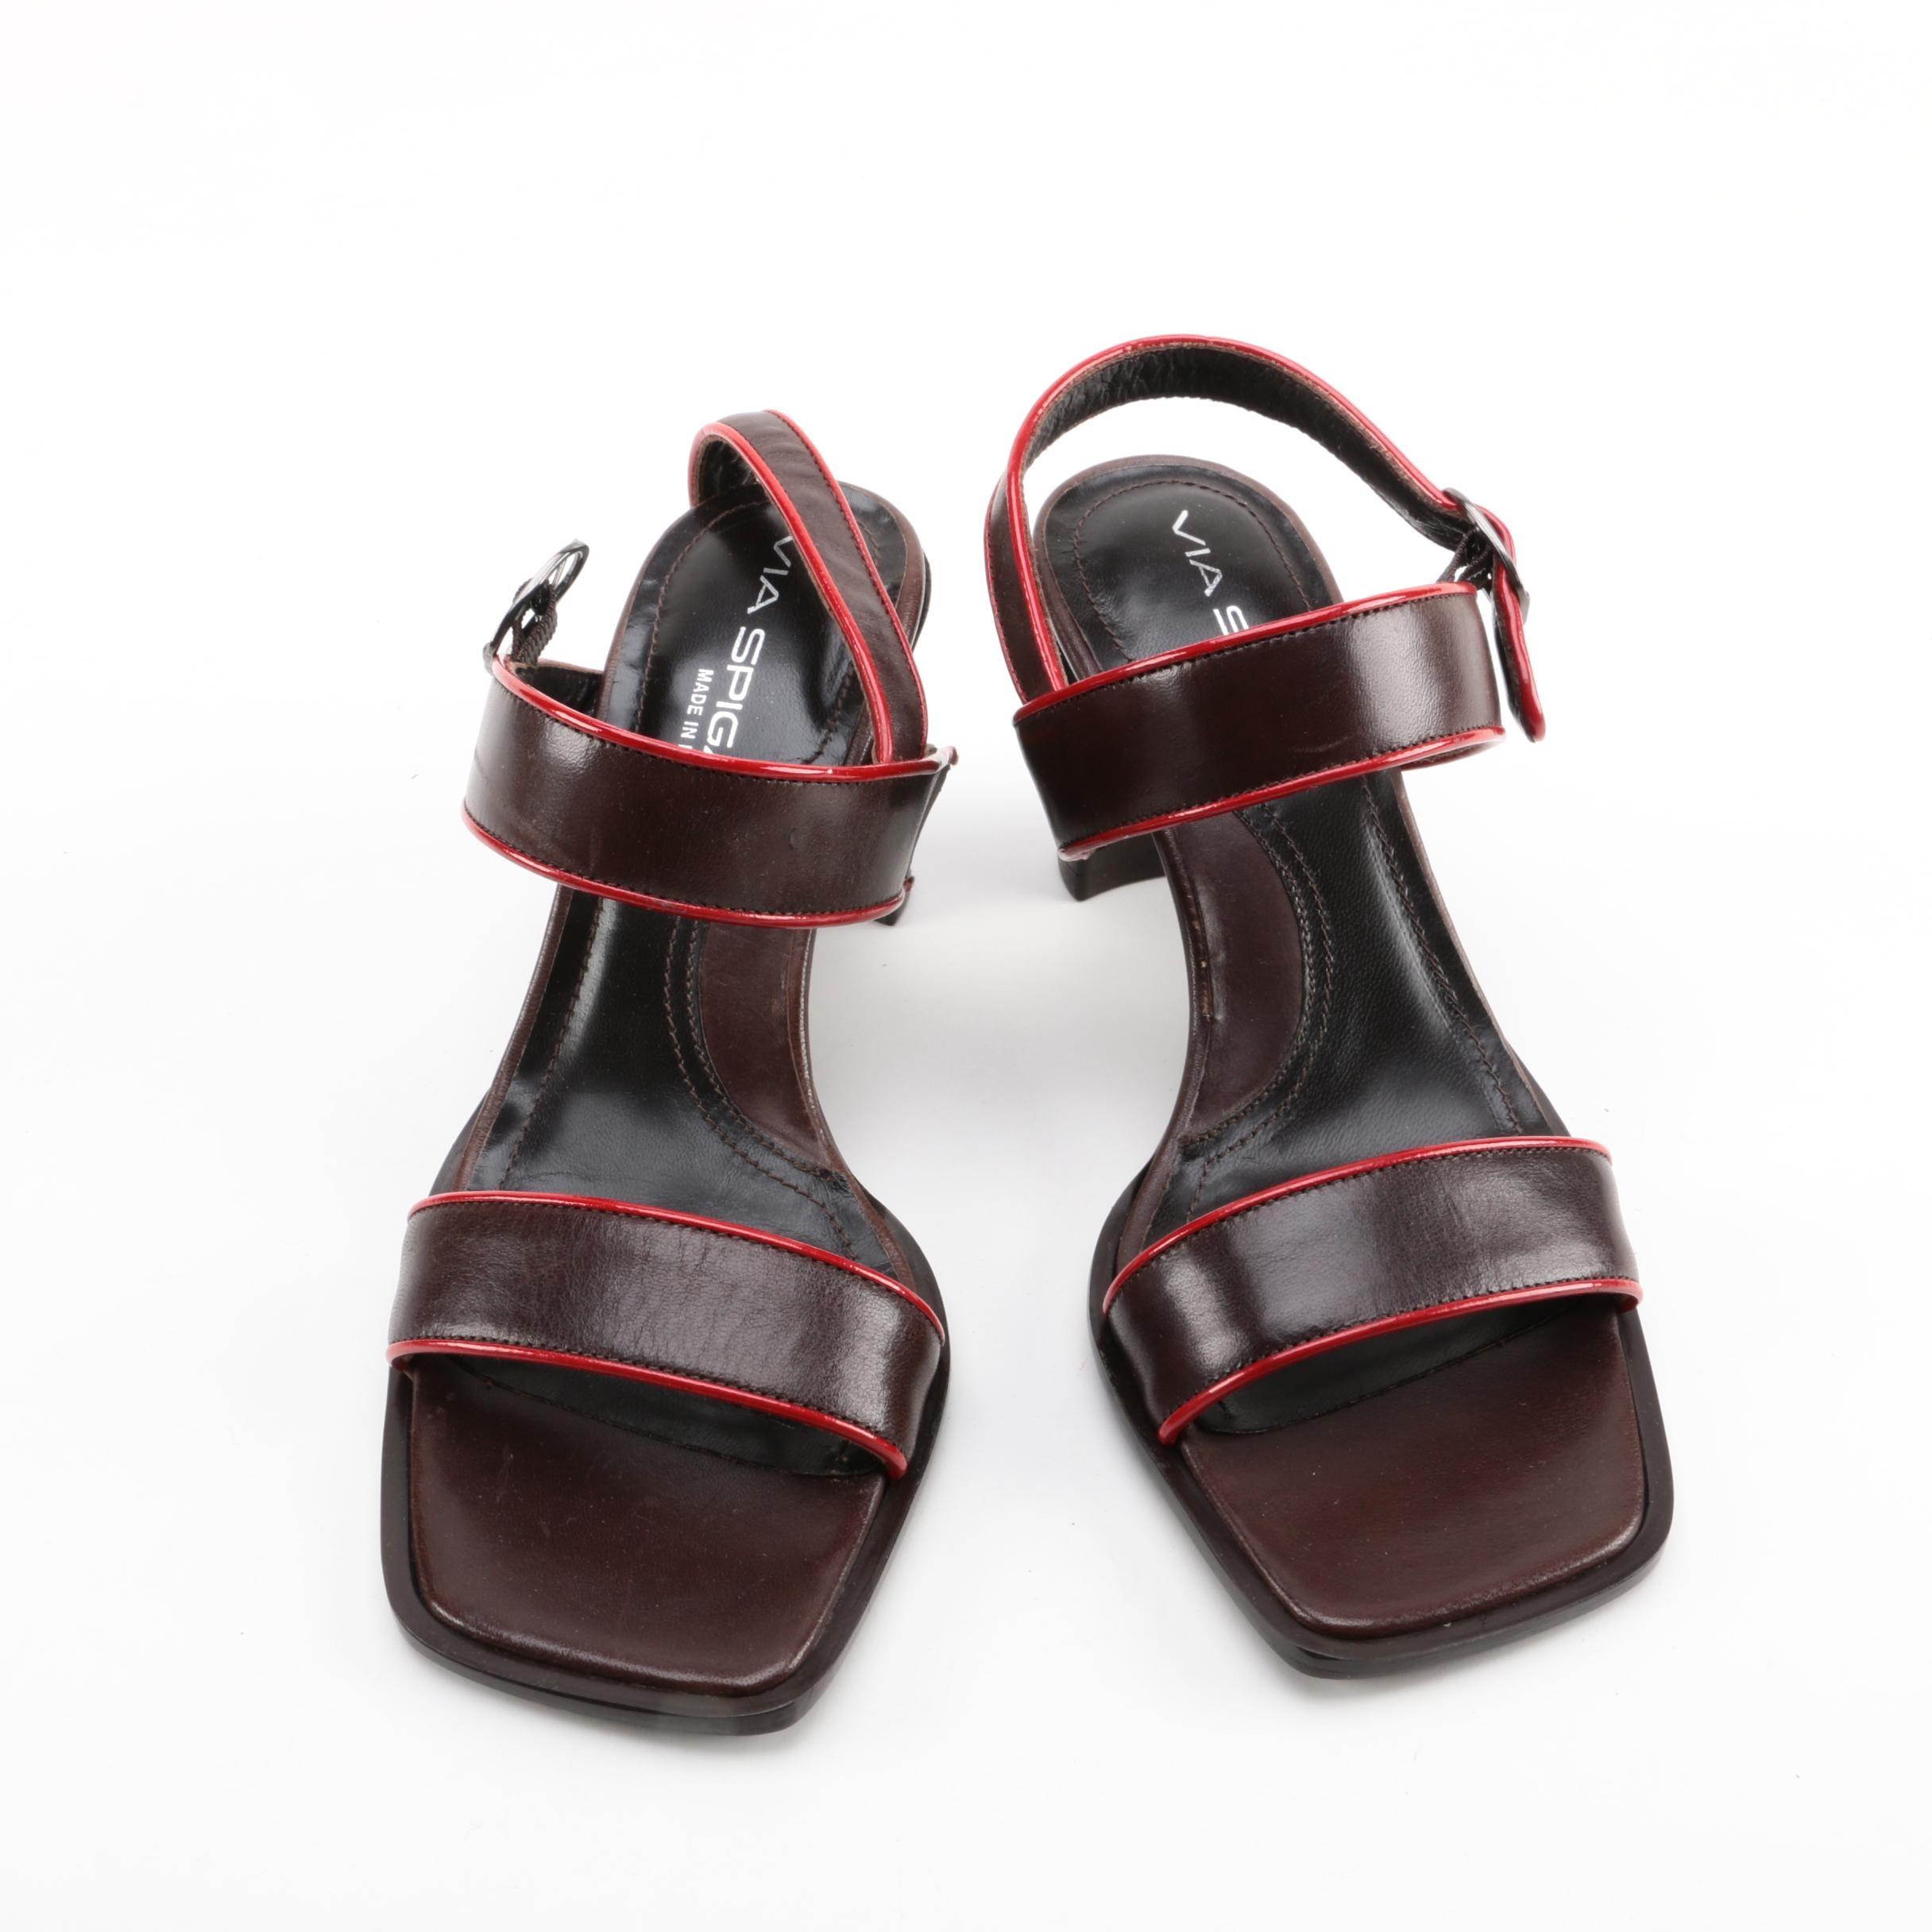 Women's Via Spiga Leather Heeled Sandals